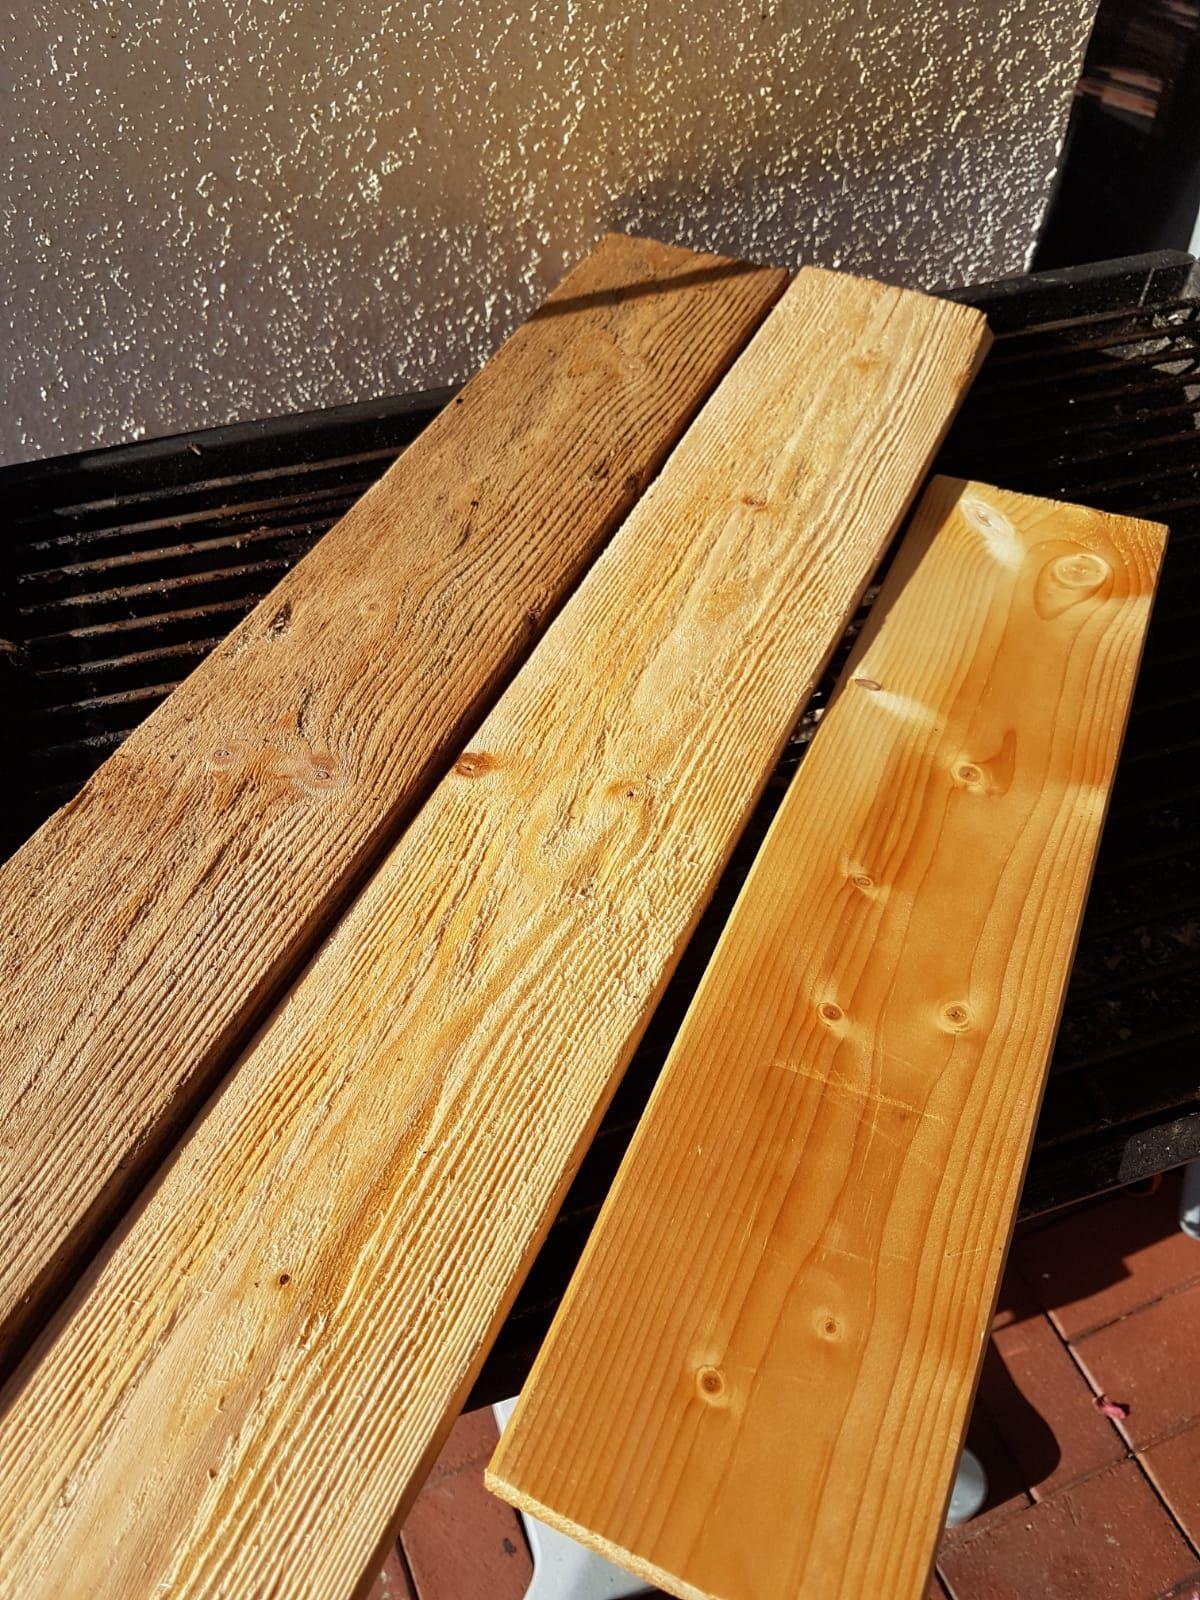 Beize Einfach Selber Herstellen Verwittertes Holz Diy Into The Woods Altholz